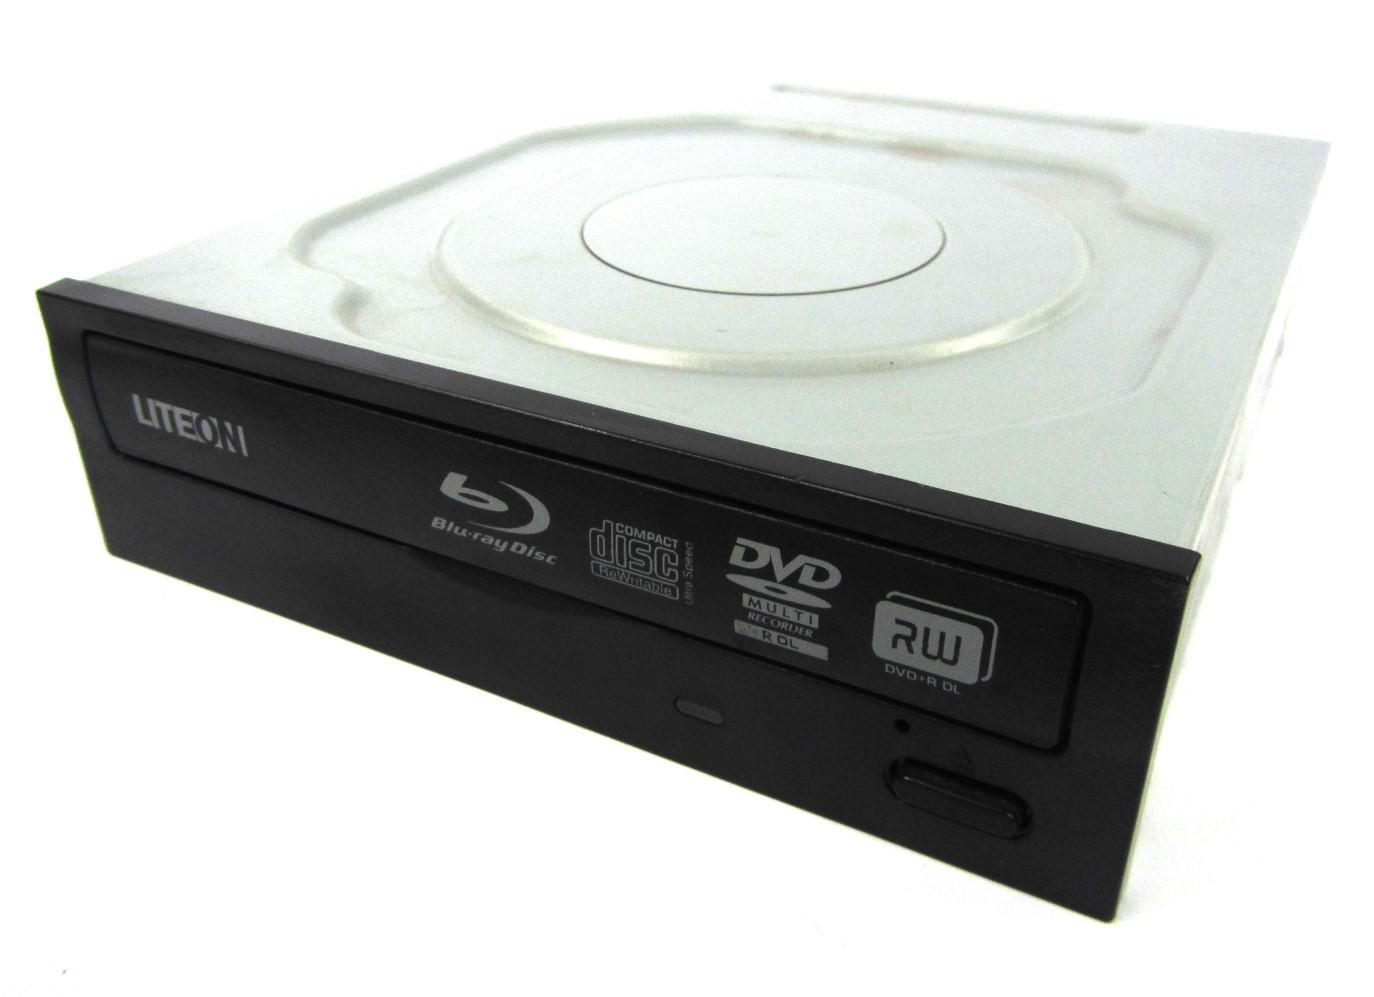 iHBS312-31 Lite-On Blu-Ray/DVD/CD Rewritable SATA Optical Drive